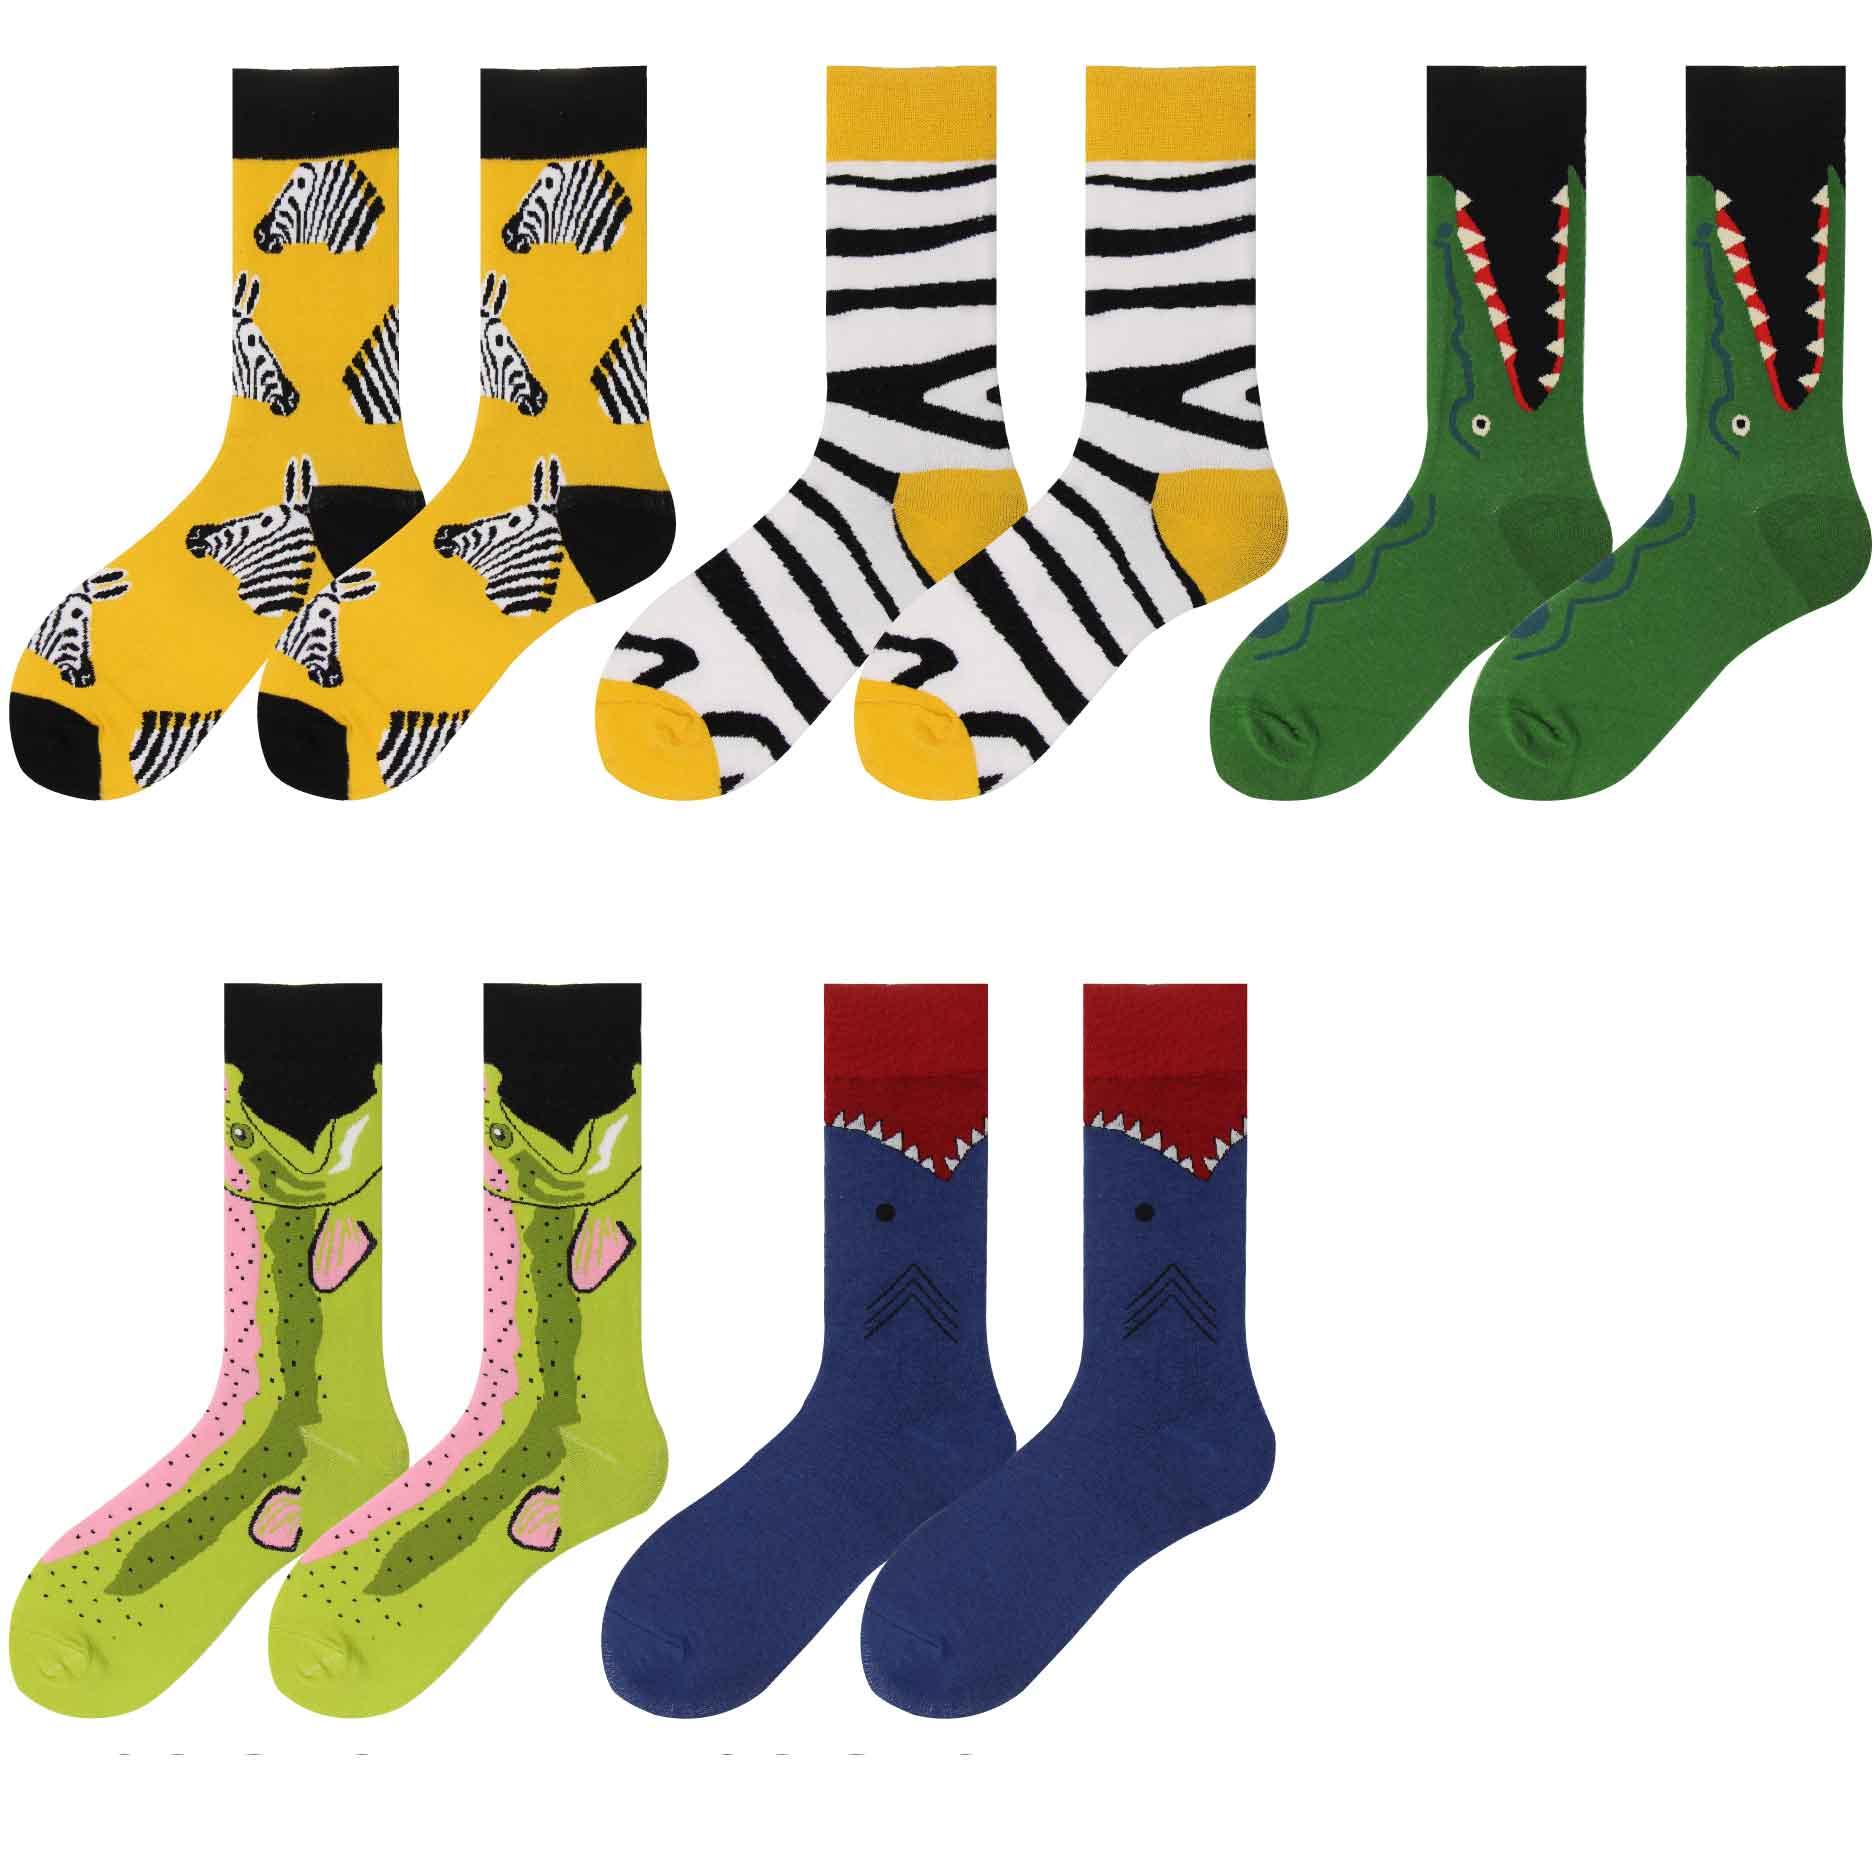 men happy socks funny gifts for couple cotton crocodile zebra electric eel casual marvel merino